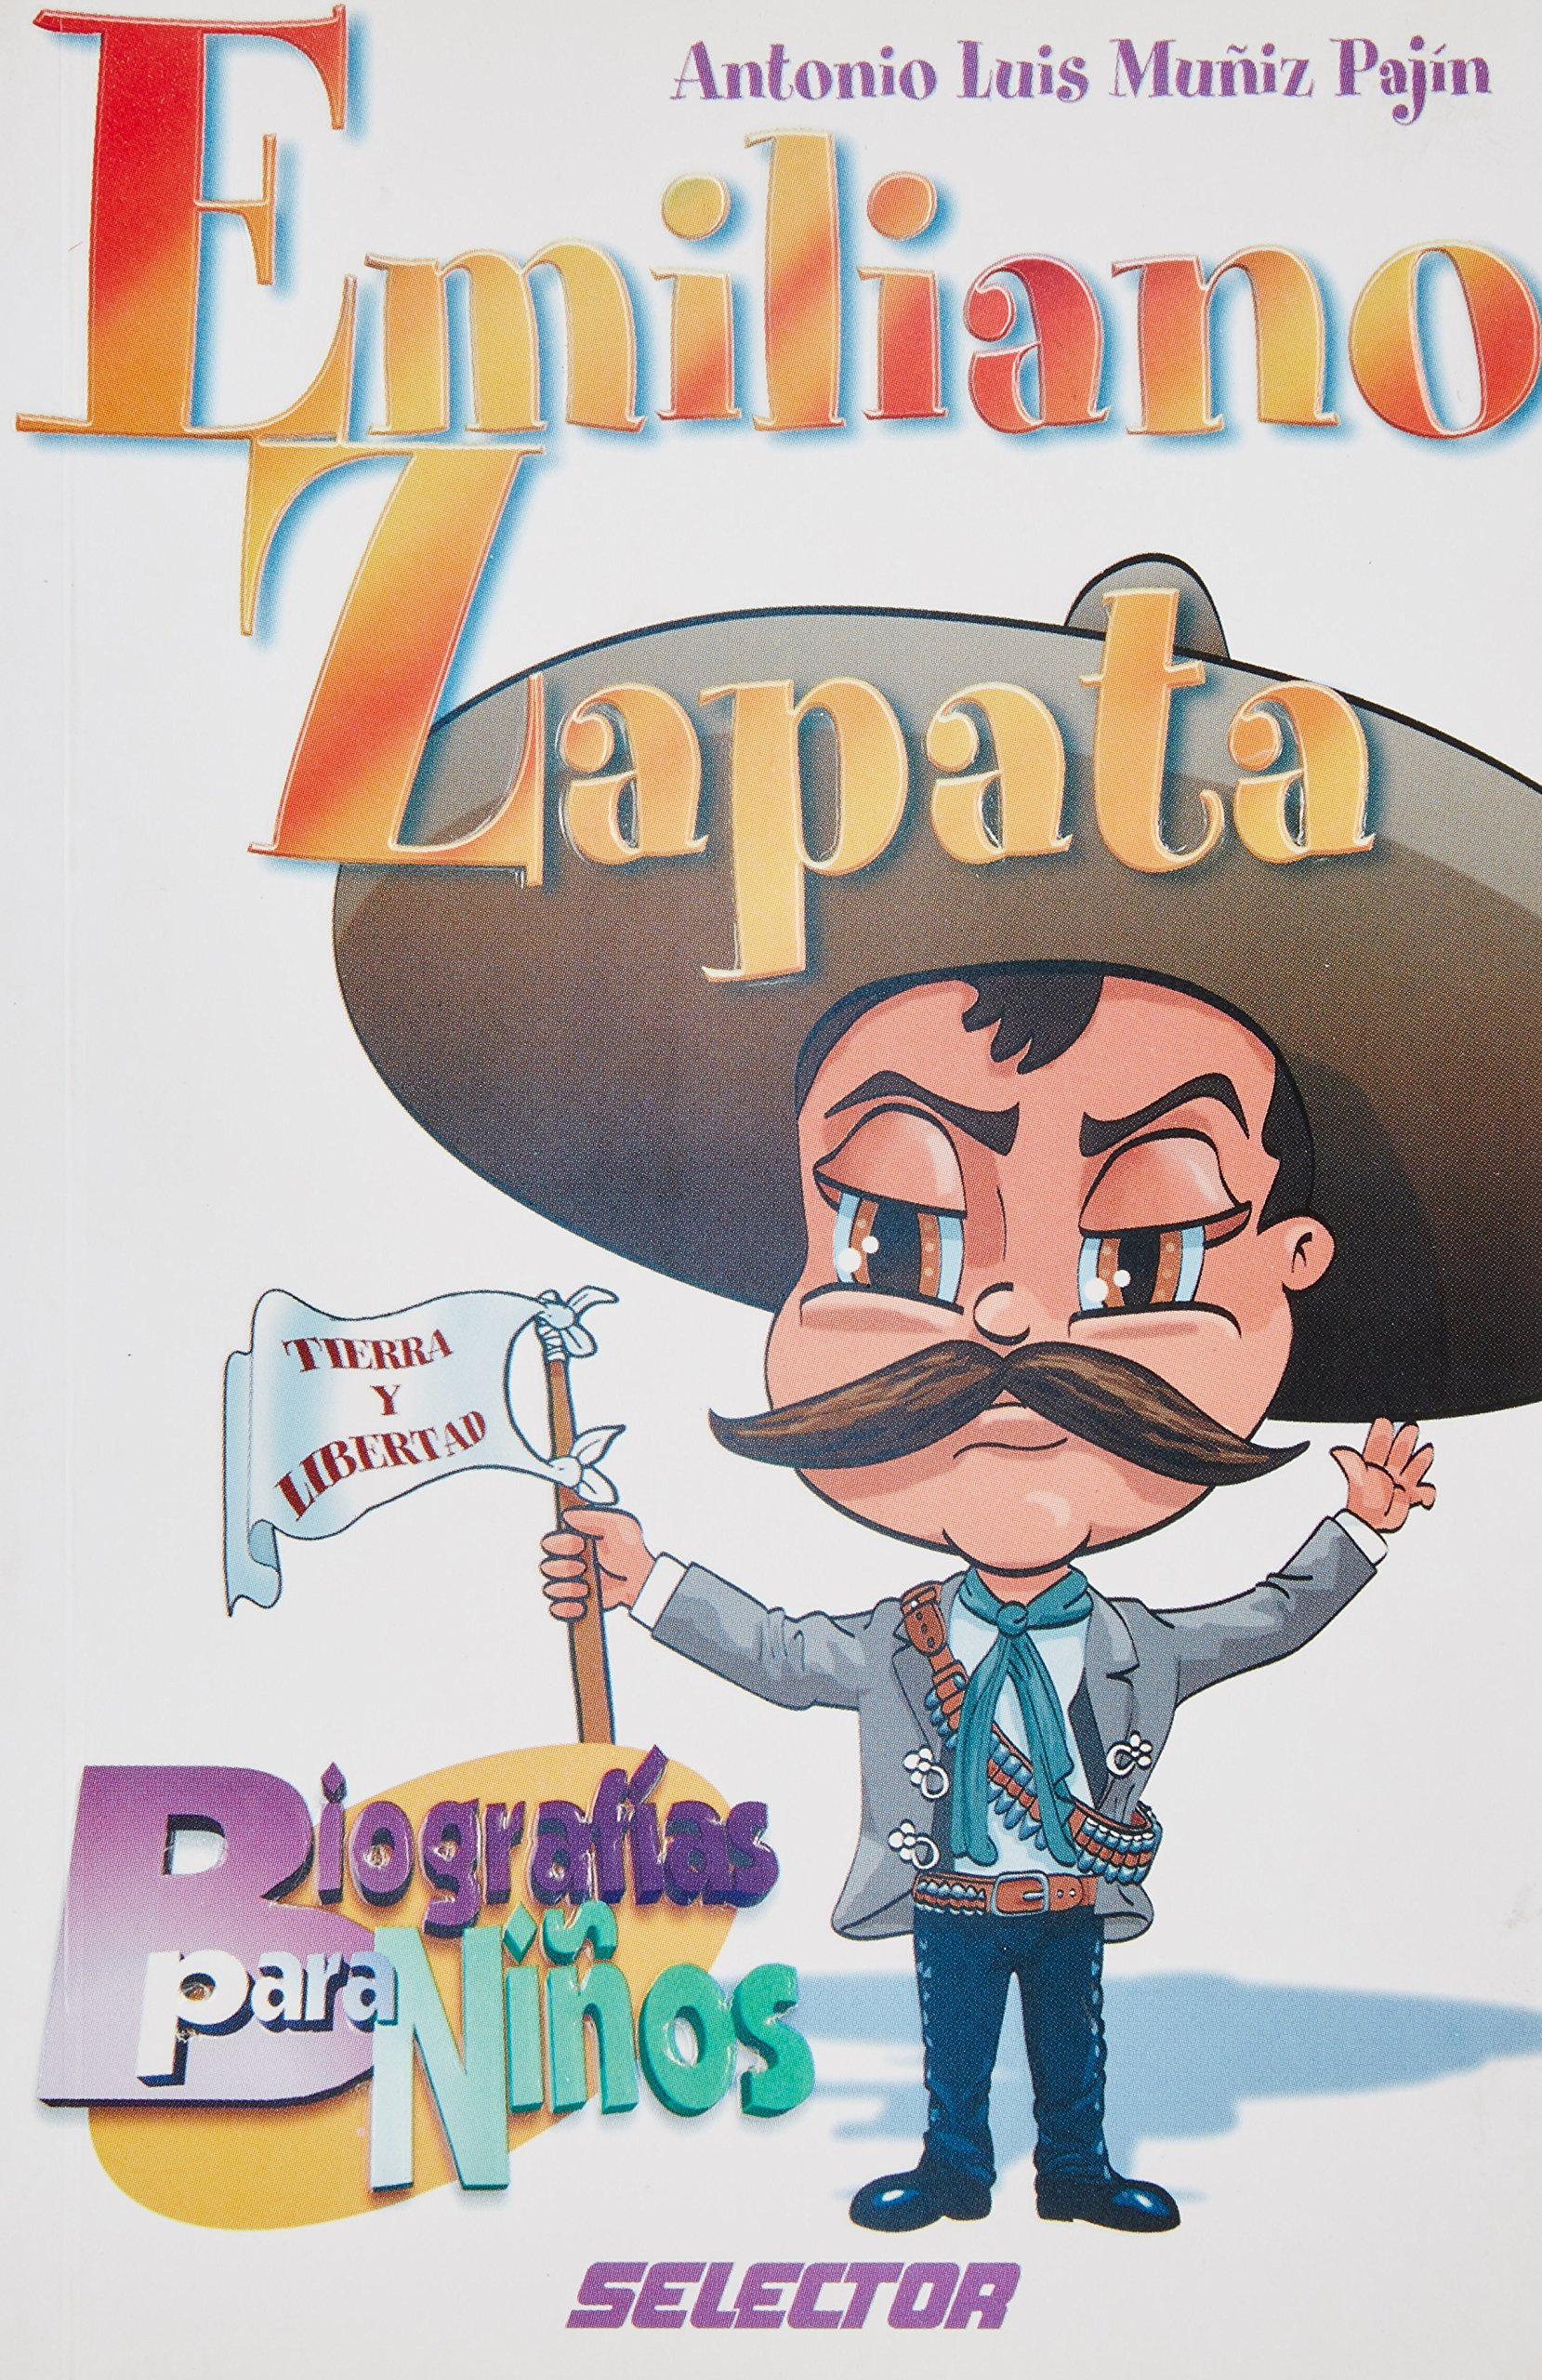 Emiliano Zapata (Biografias para ninos) (Spanish Edition)